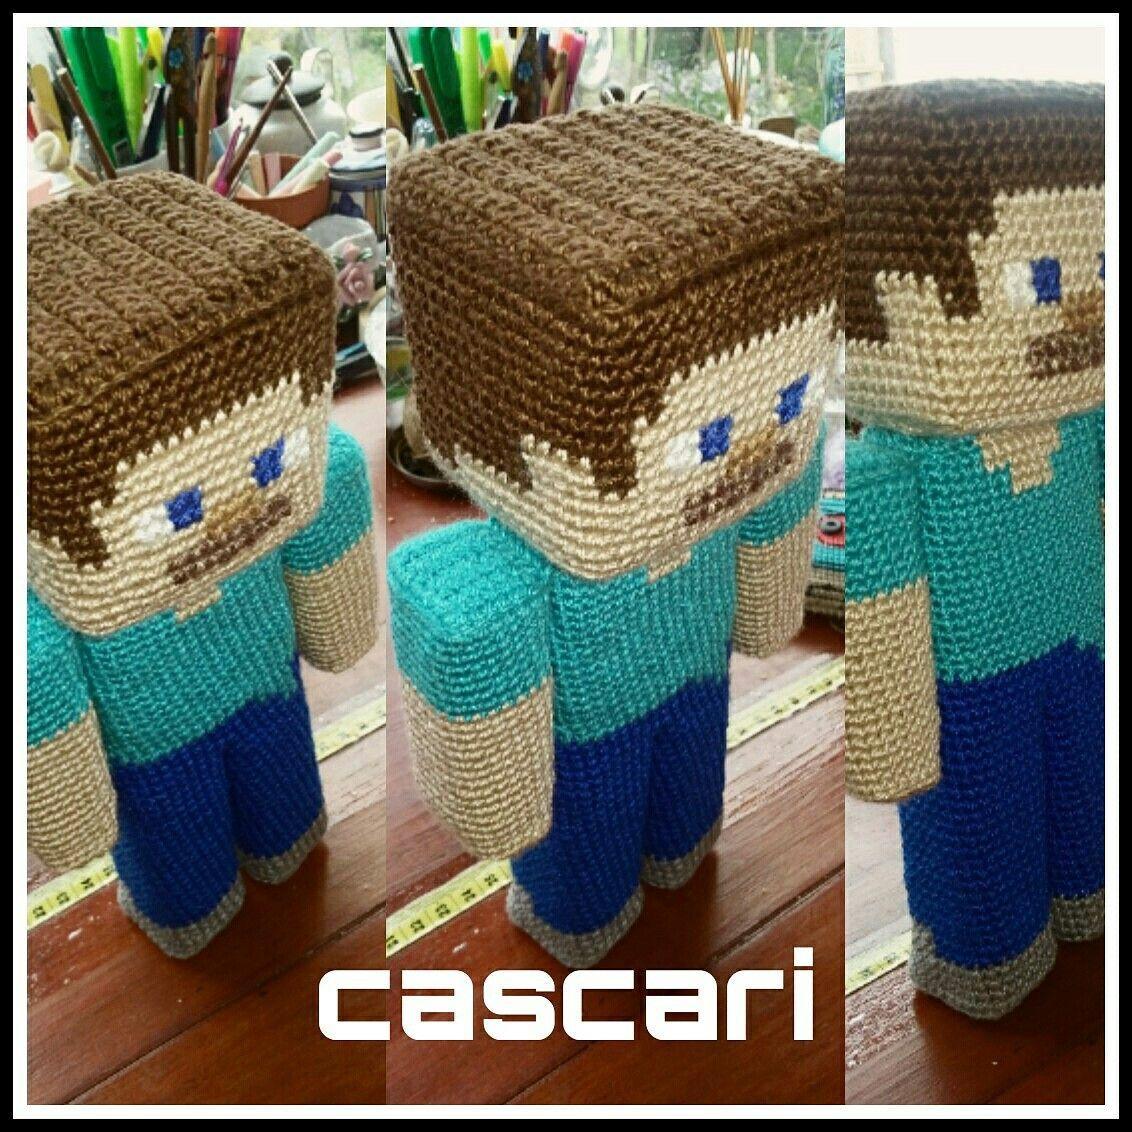 Steve Minecraft amigurumi. Patrón aridiya | Cascari Crochet ...